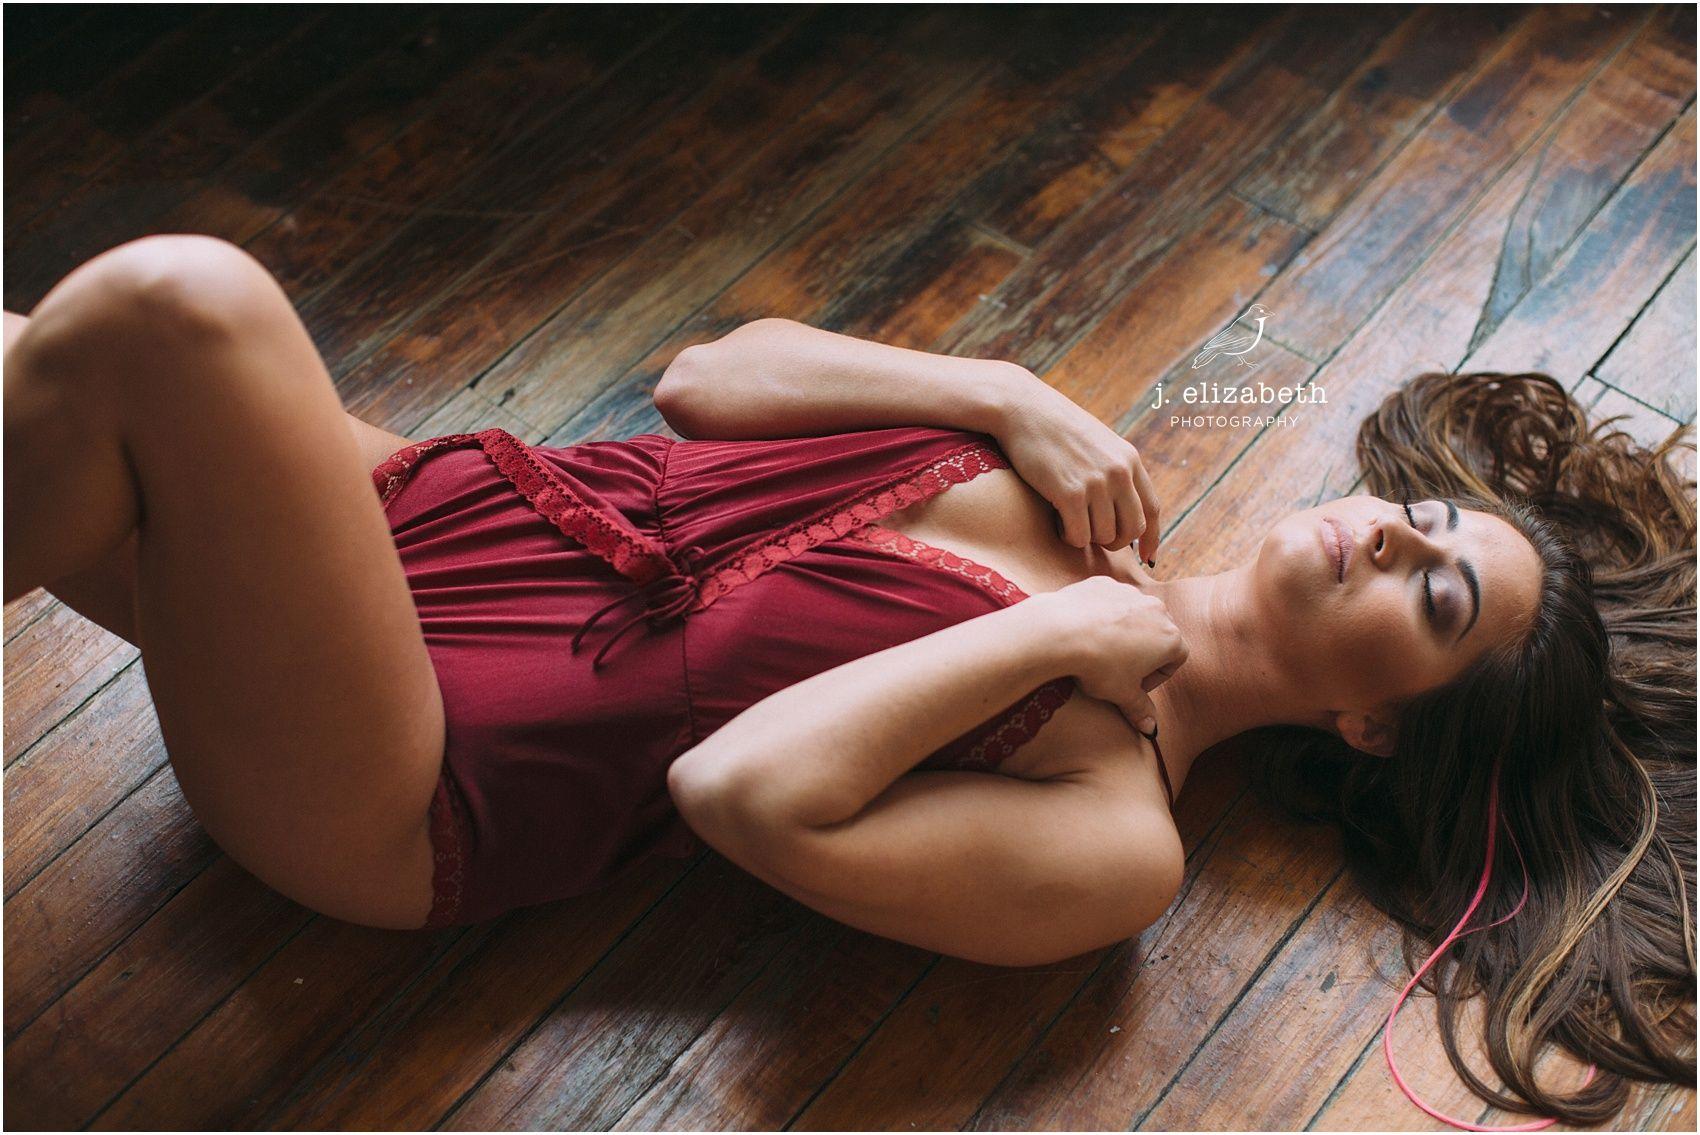 #boudoir #boudoirposes #boudoirideas #lingerie #sexy #confident #woodfloors #studio #redsatin #jelizabethphotography   http://www.jelizabethphotos.com/